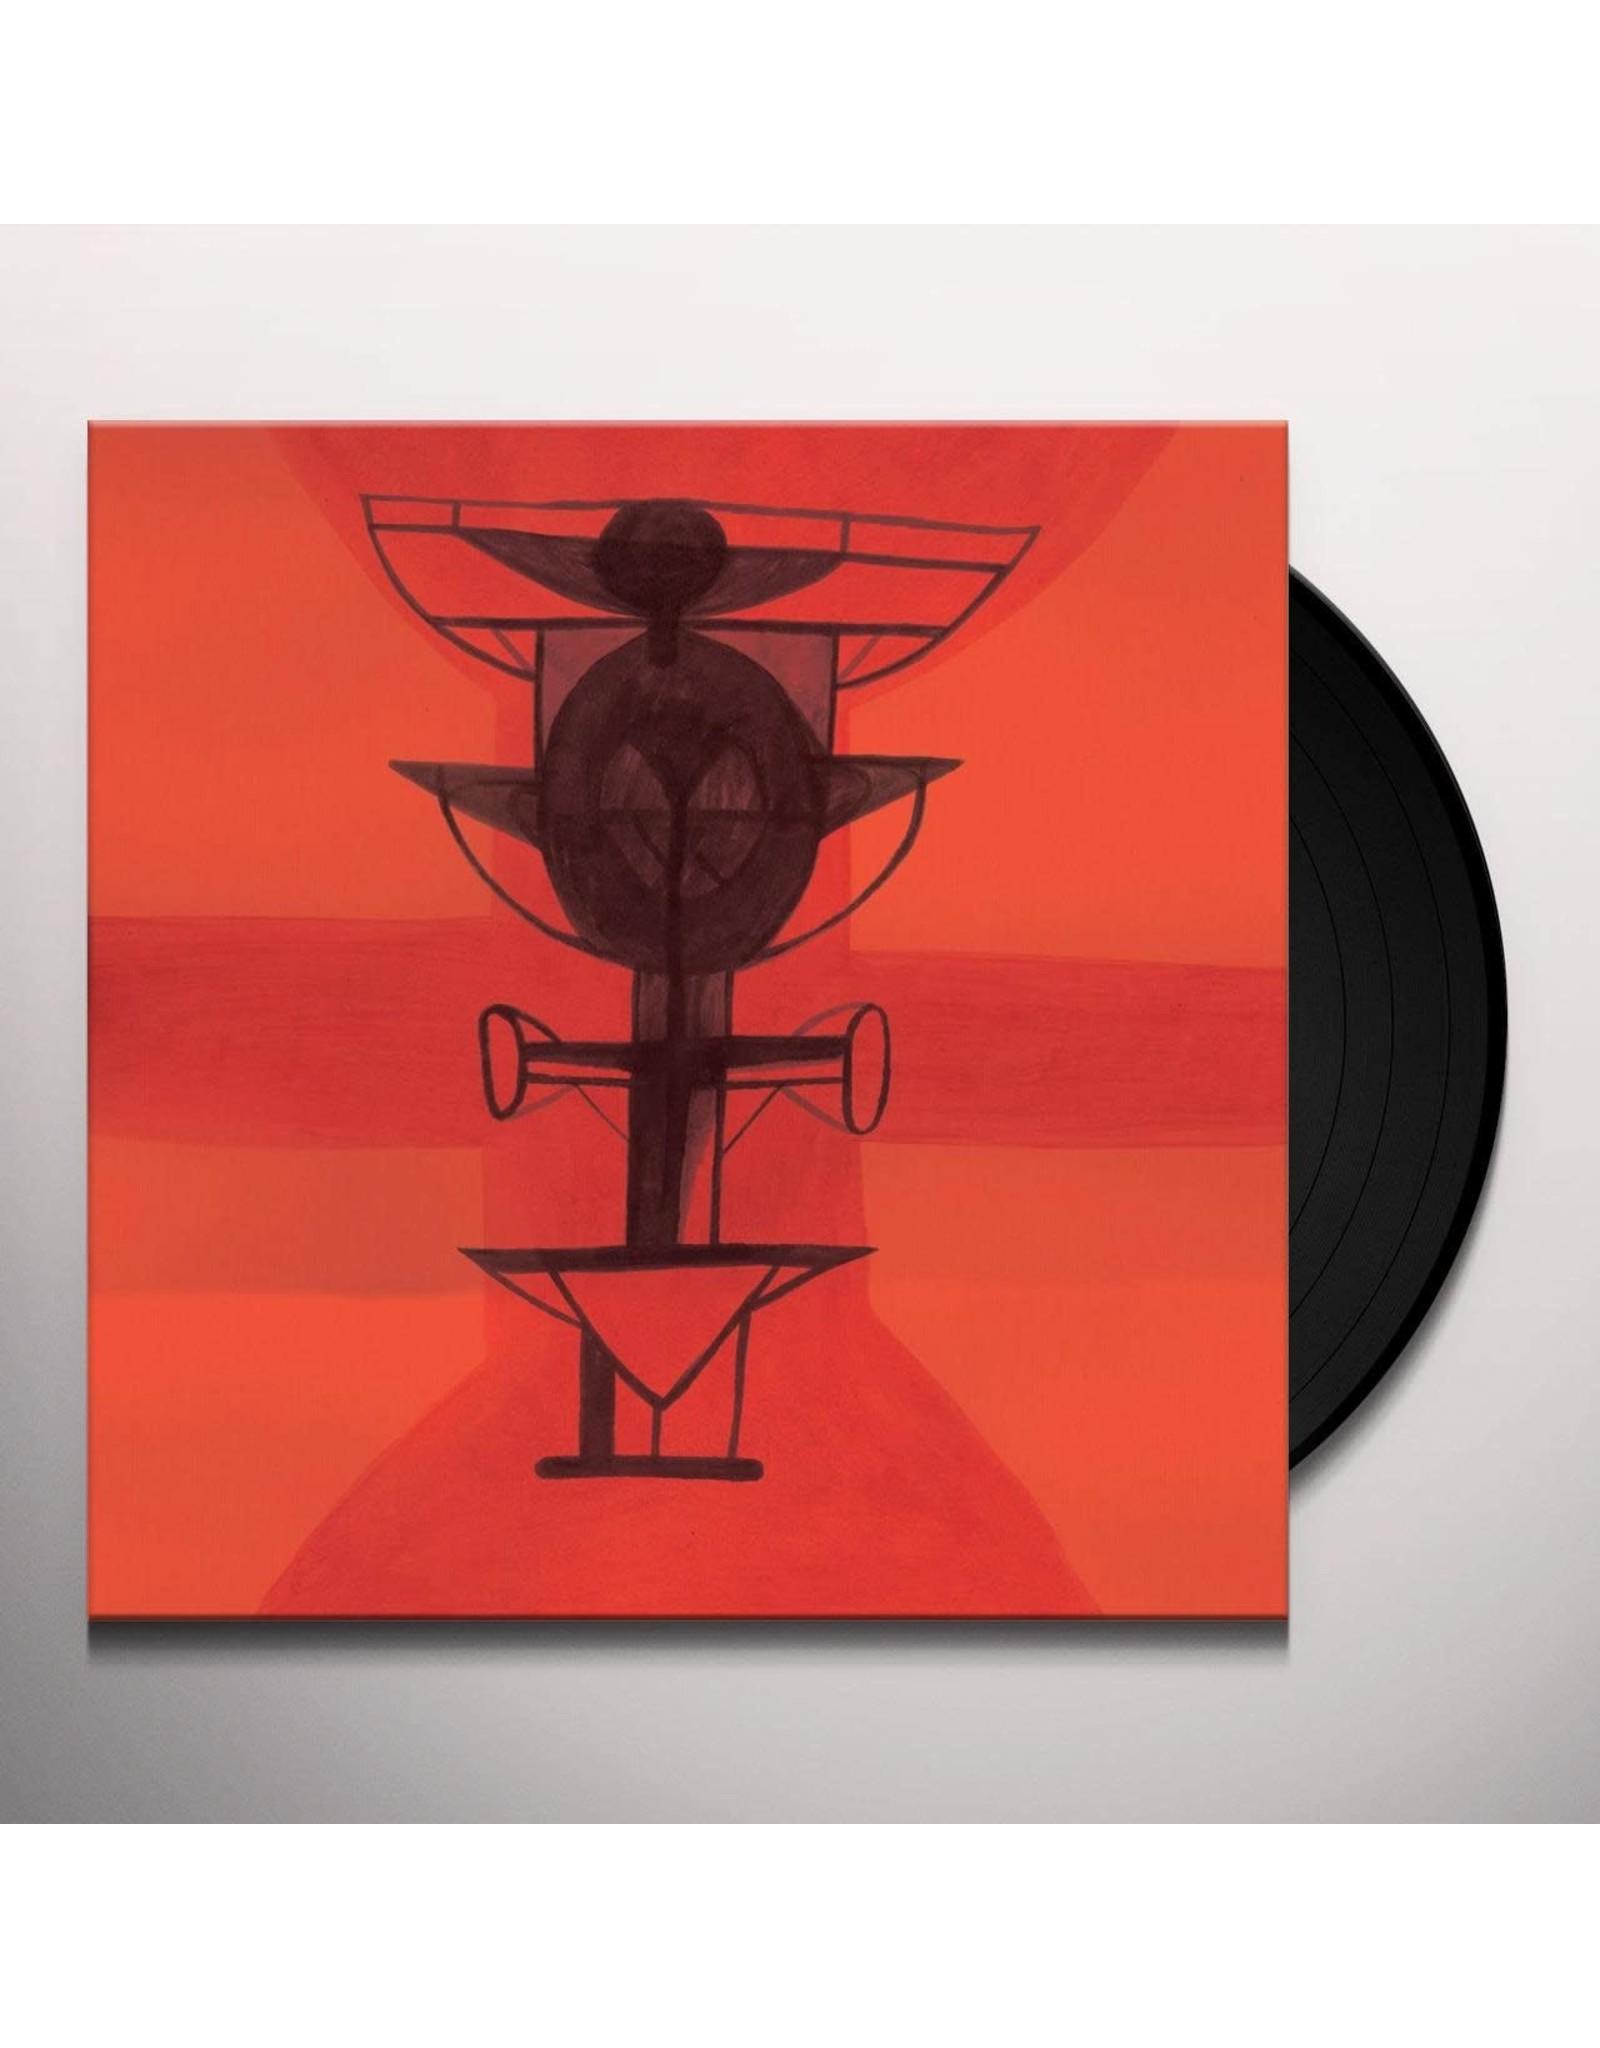 New Vinyl Nightmares On Wax - Back To Nature: Ricardo Villalobos Remixes LP